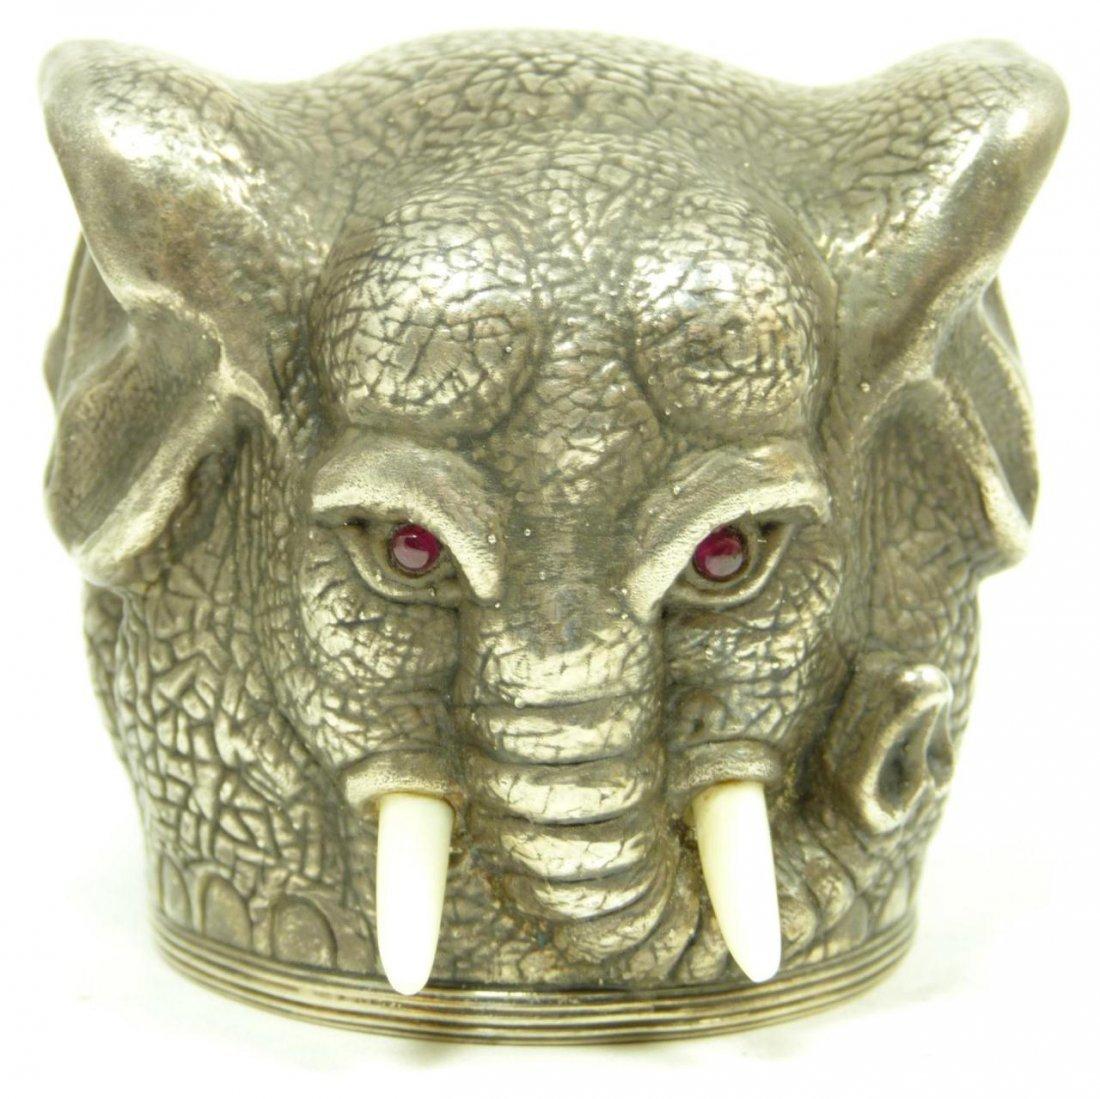 426: RUSSIAN SILVER ELEPHANT SHOT GLASS RUBY IVORY - 3